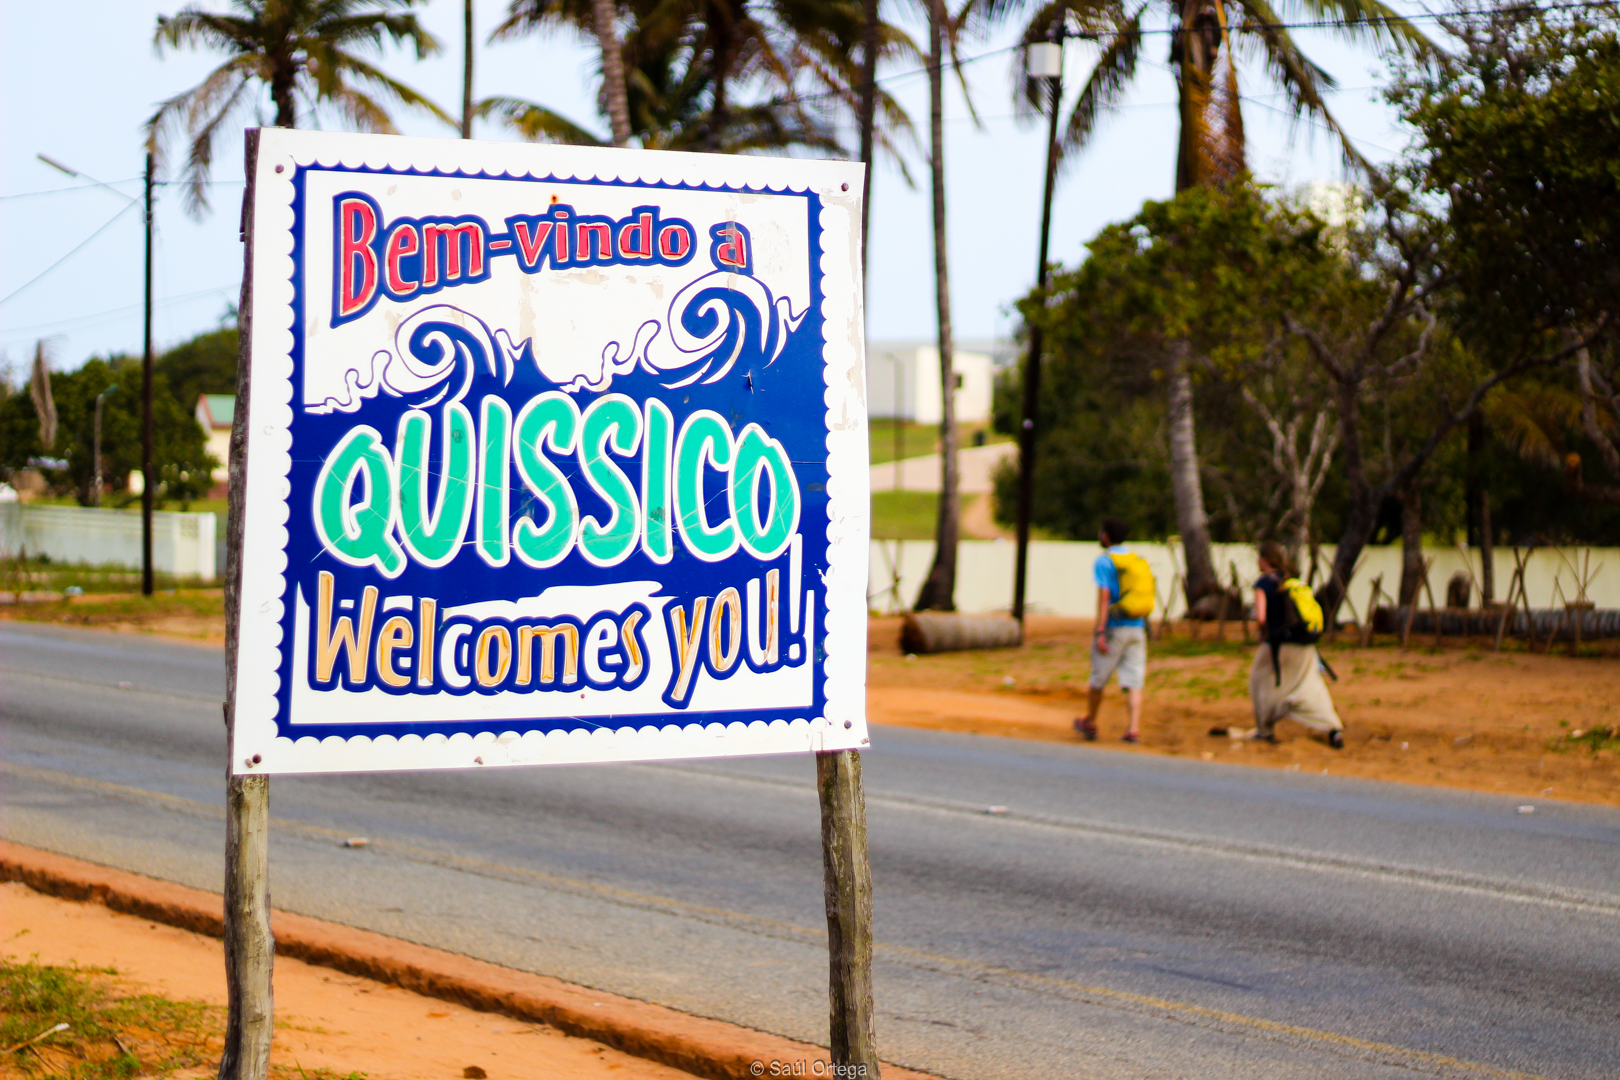 Bienvenidos a Quissico (Mozambique)